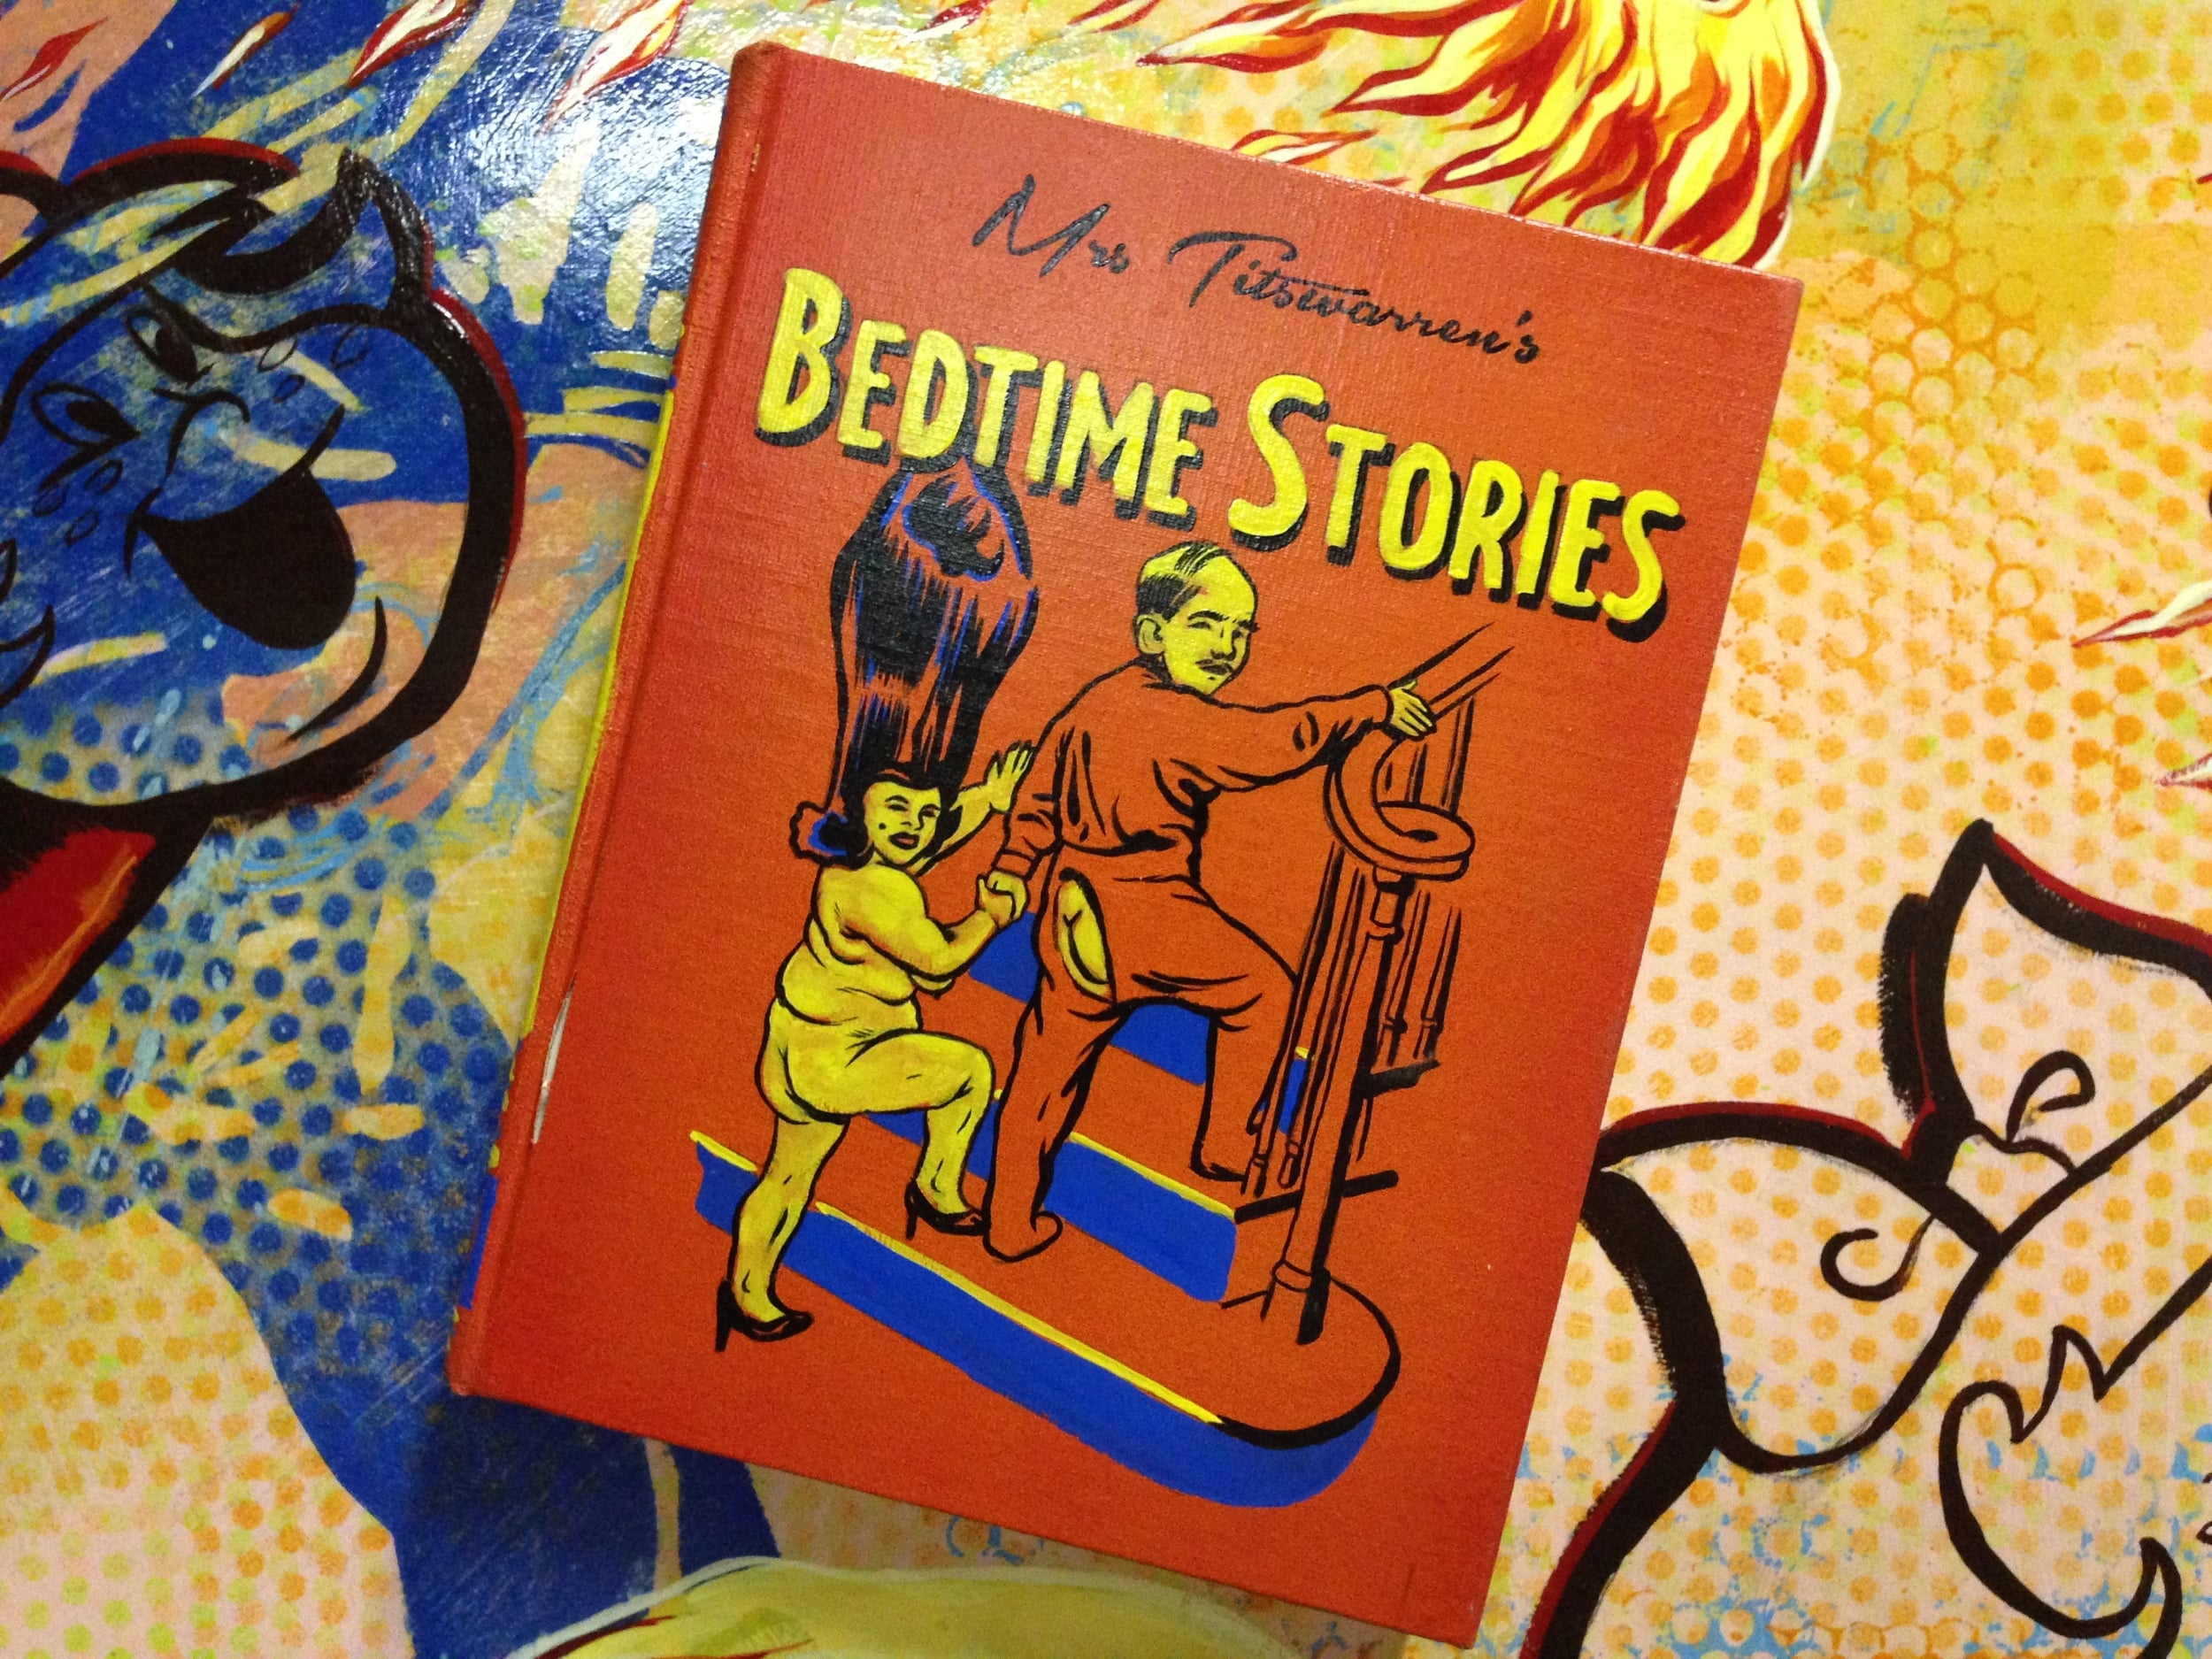 Mrs Titswarren Bedtime Stories (Book Detail)